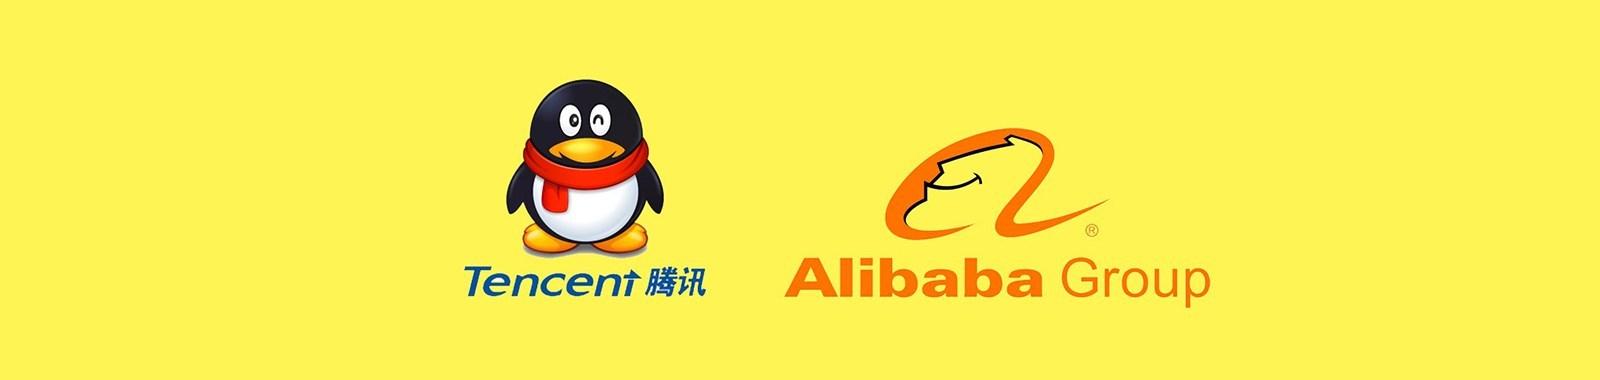 tencent-alibaba1600x440